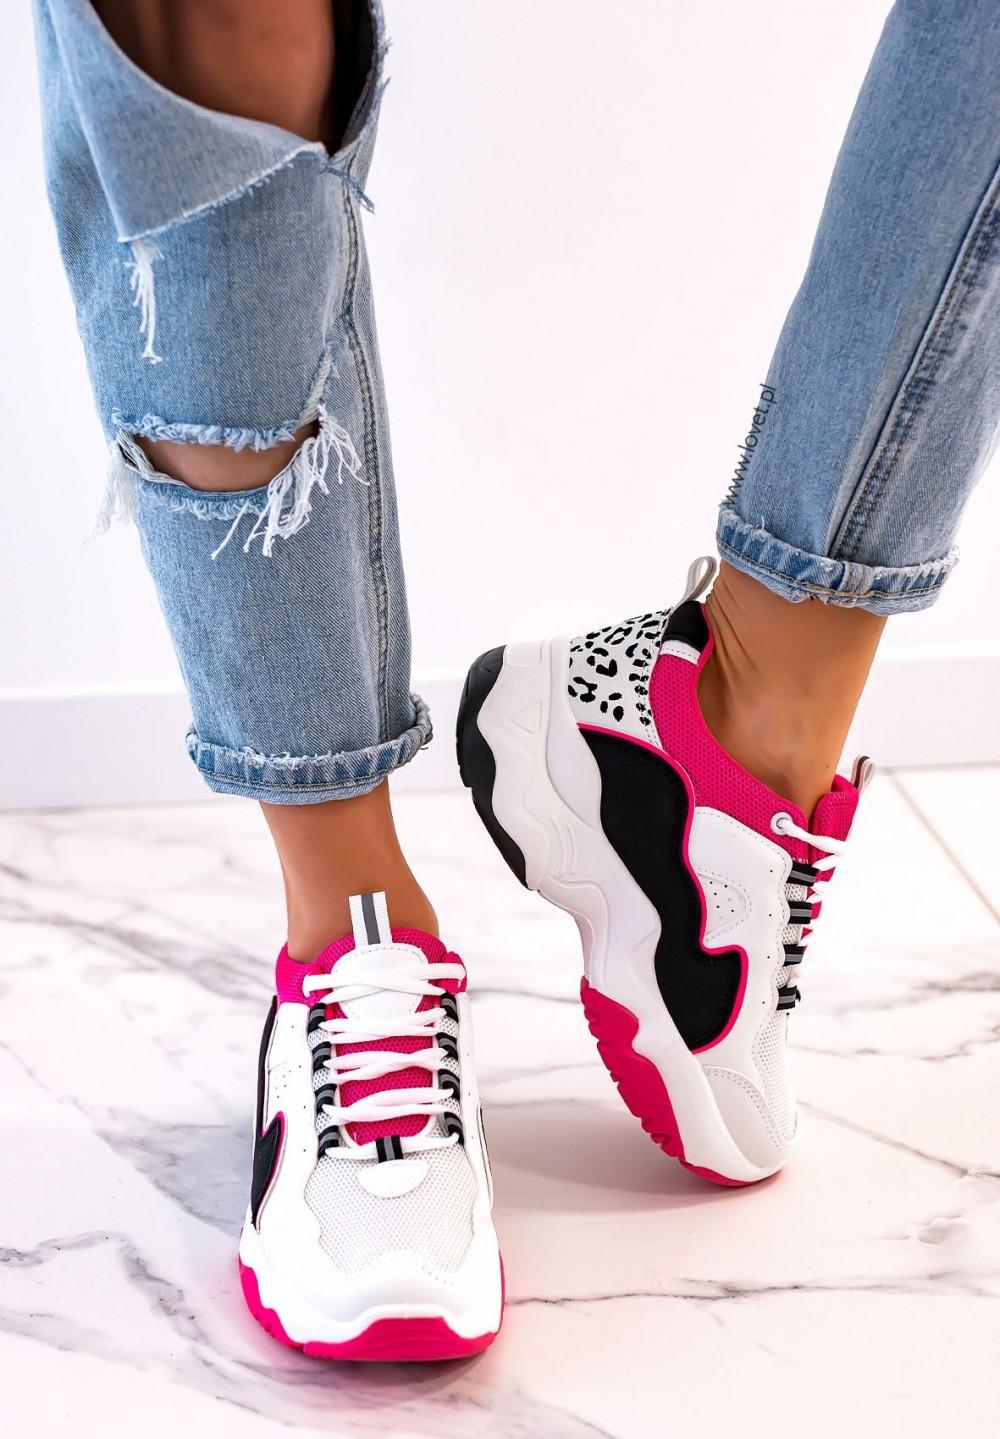 Sneakersy Sznurowane Fuksjowe Fluo Carol